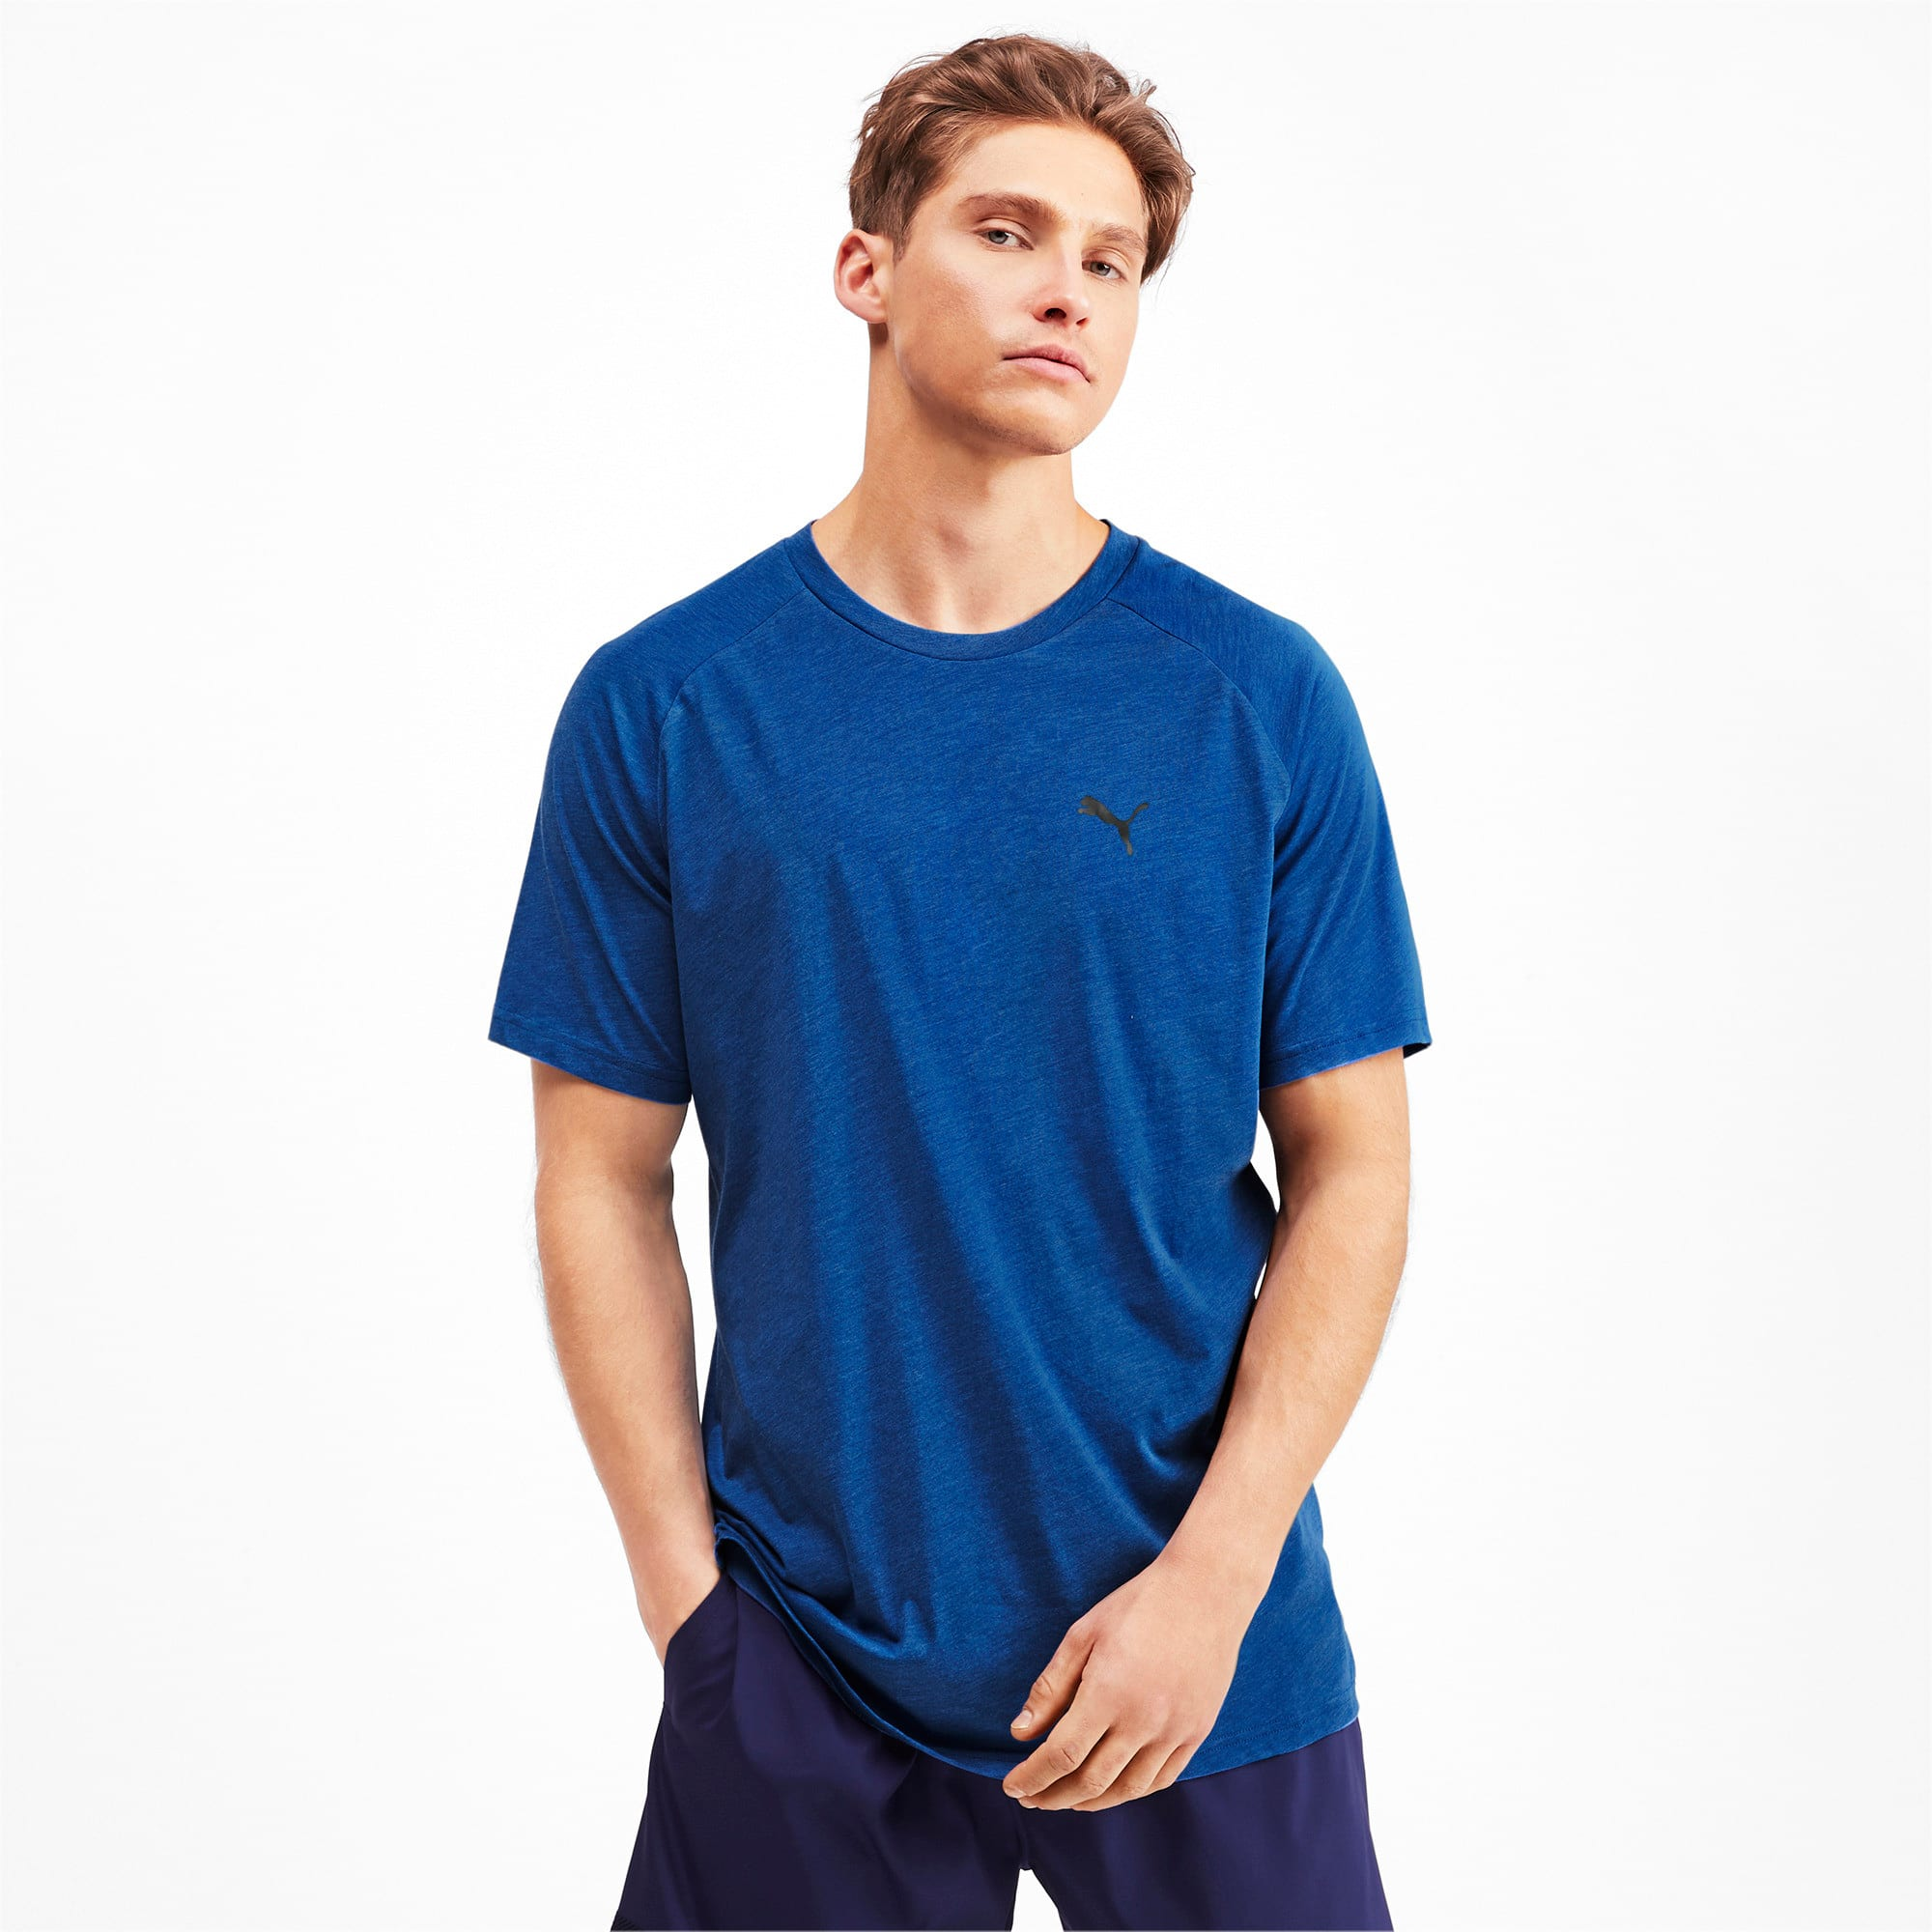 Thumbnail 1 of T-Shirt Reactive pour homme, Galaxy Blue Heather, medium